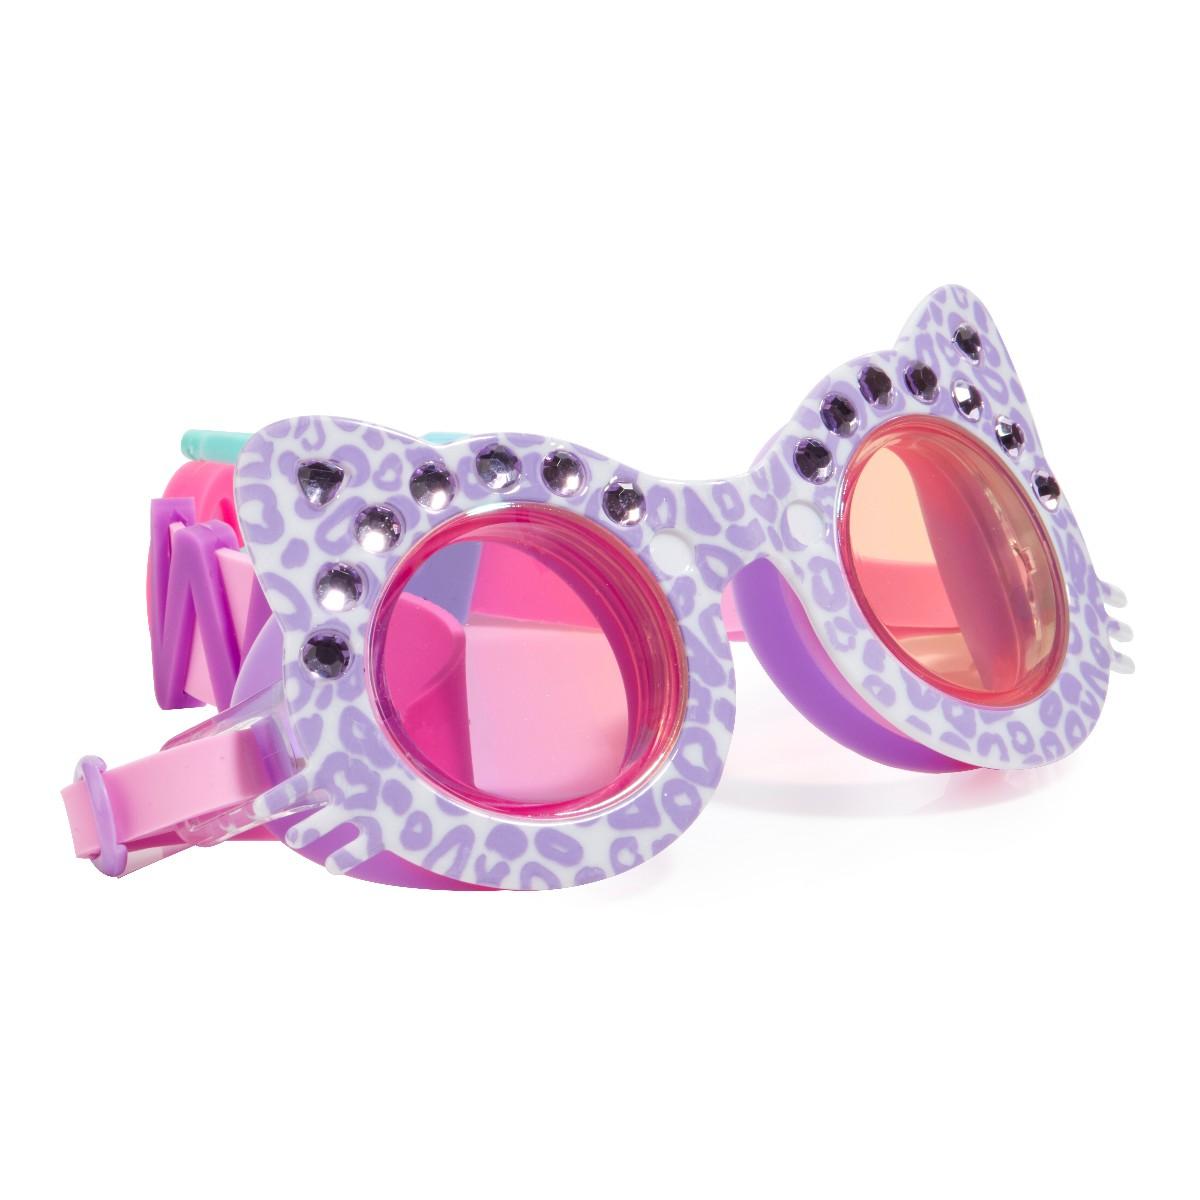 Svømmebrille, Kat lilla